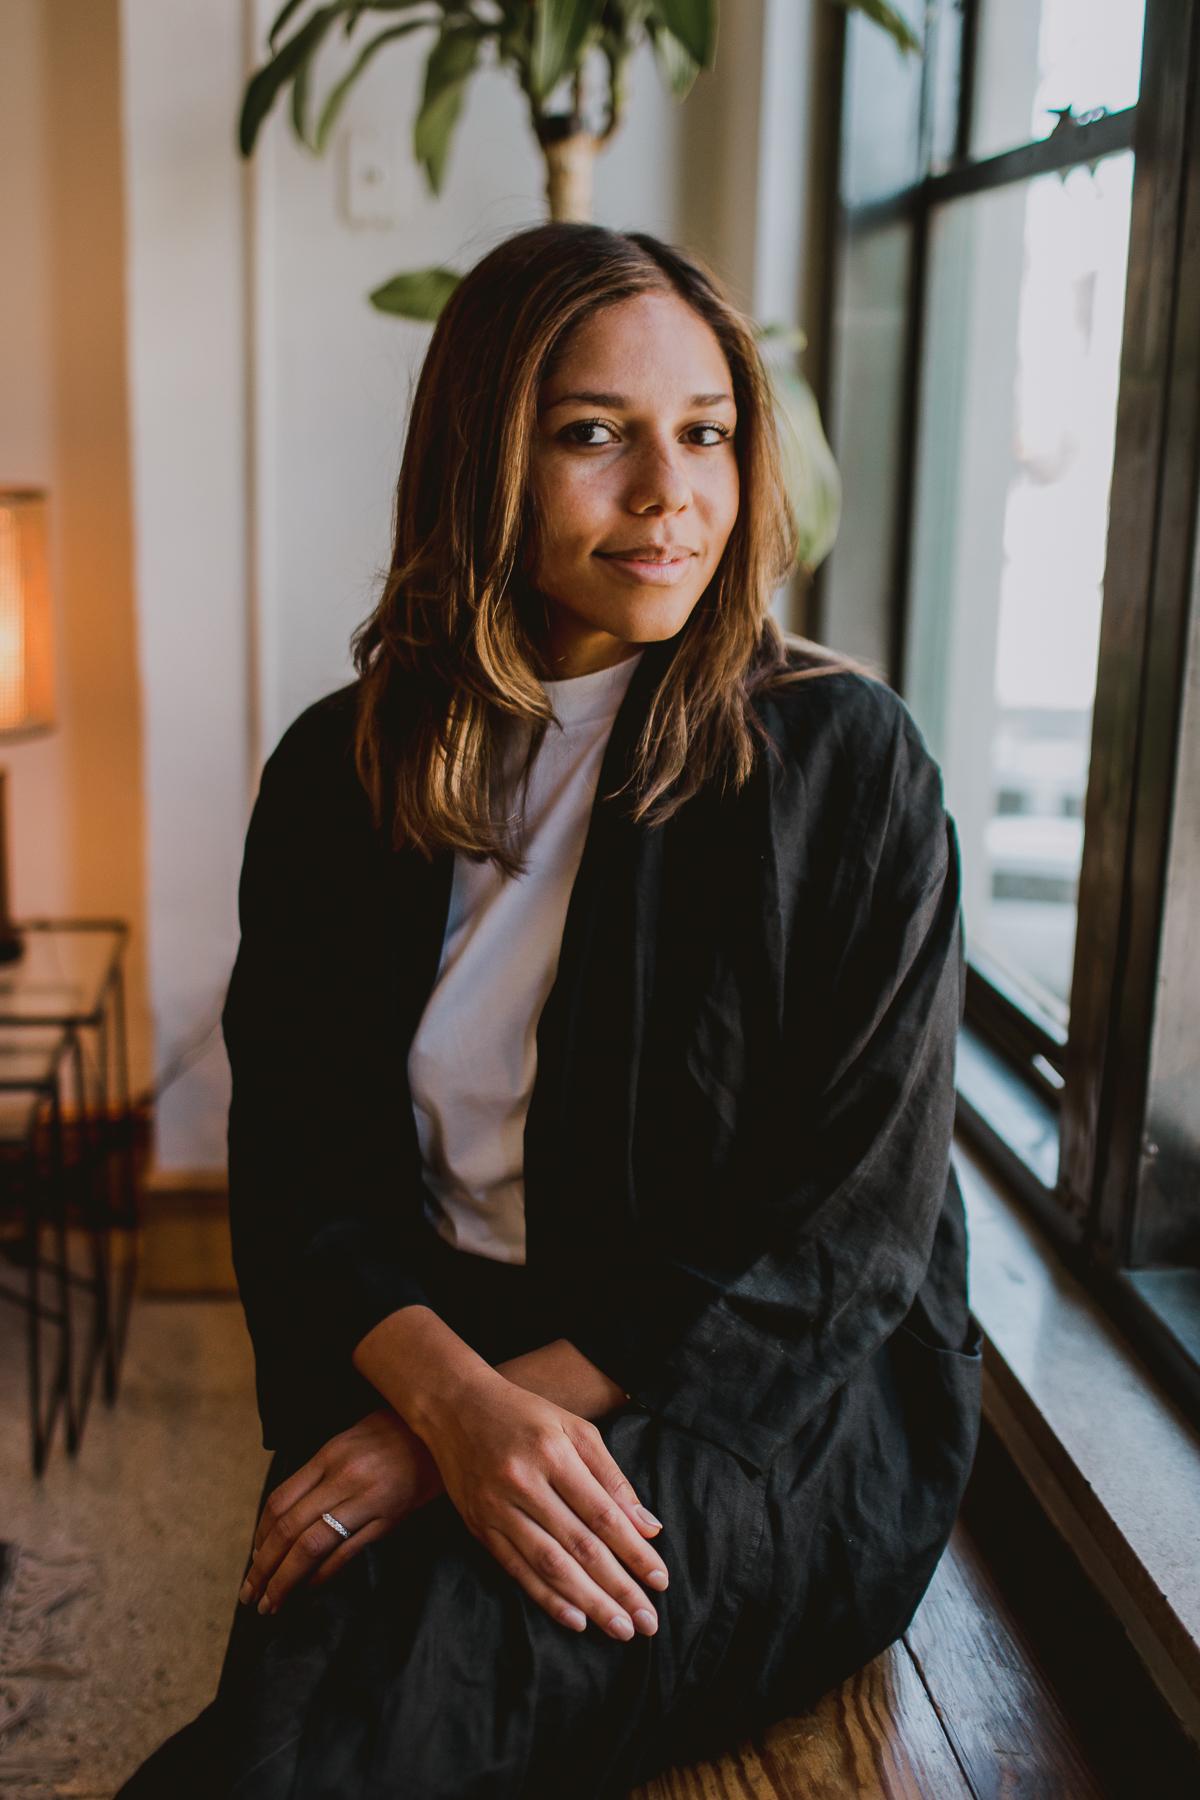 jonna-humphries-kelley-raye-tribe-and-york-los-angeles-branding-photographer-59.jpg